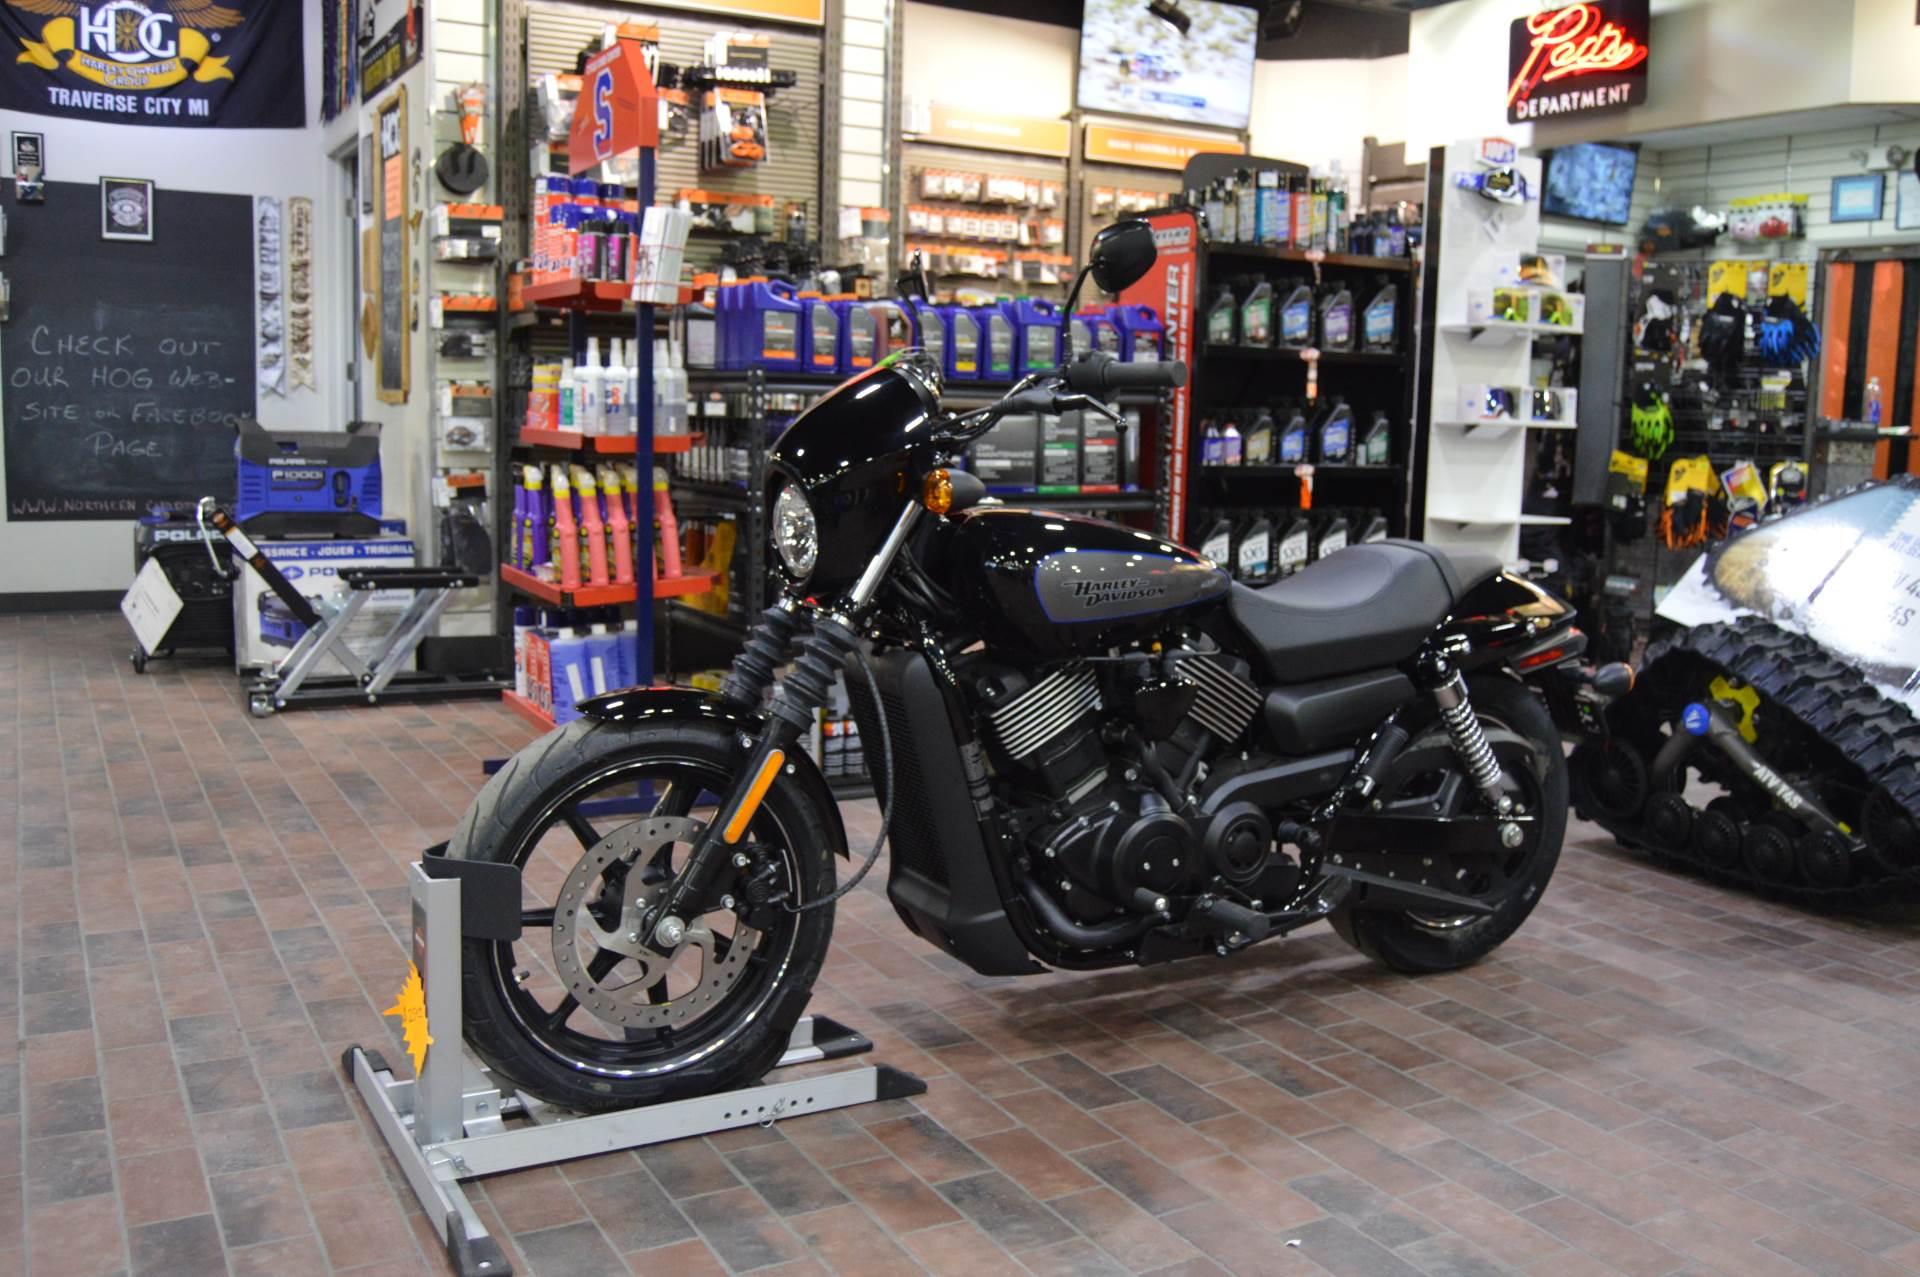 2017 Harley-Davidson Street® 750 in Traverse City, Michigan